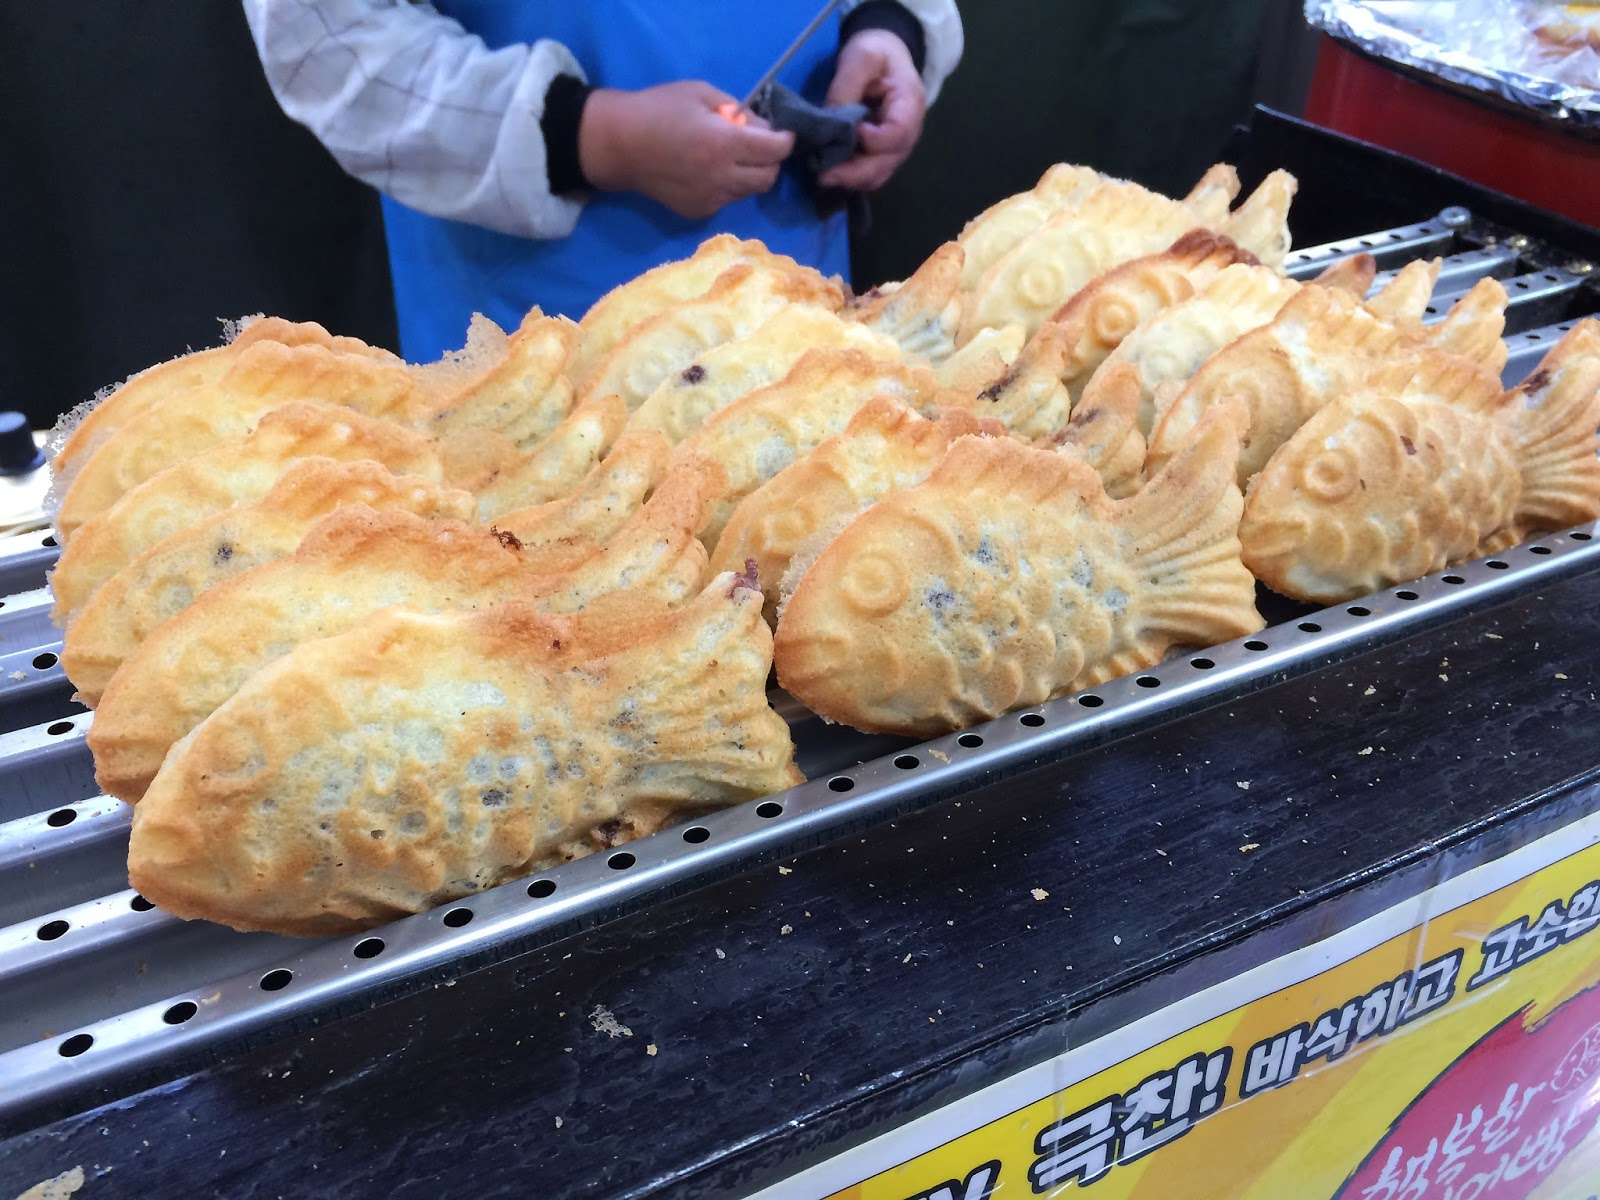 Street food coréenne - Bungeoppang